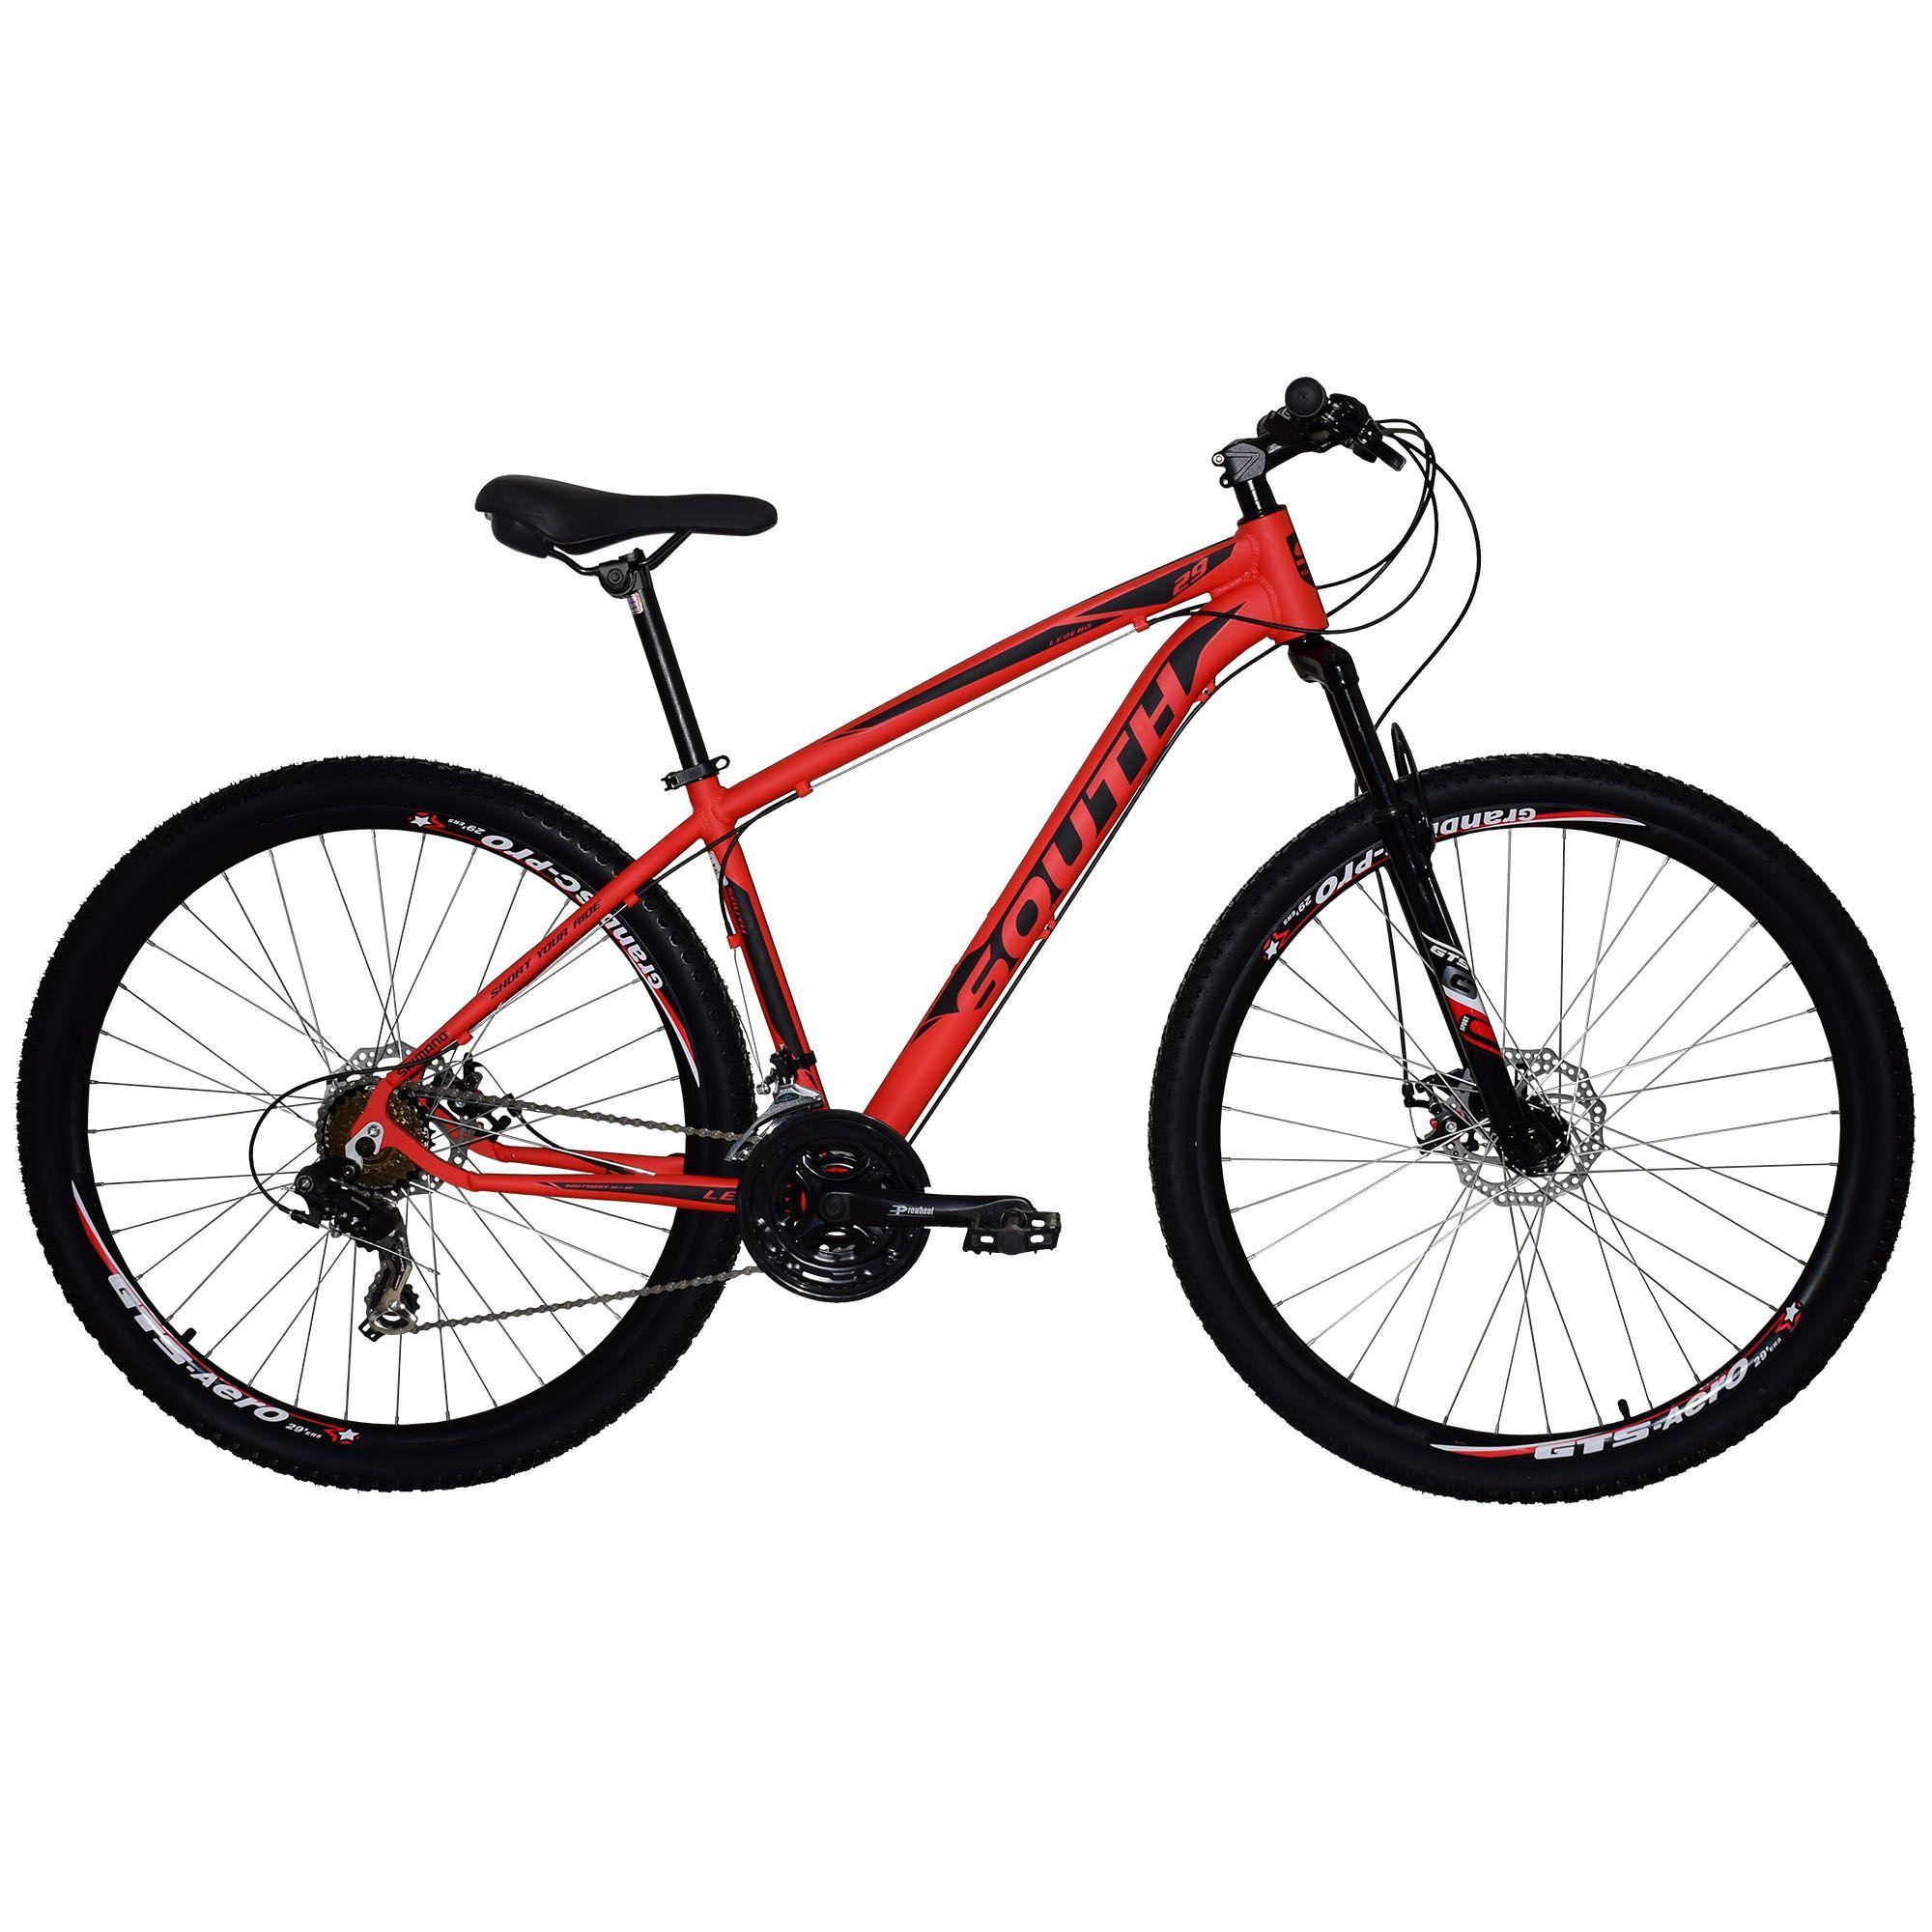 Bicicleta South Legend 2018 - 24 Marchas - Aro 29 - Câmbio Shimano - Freios á disco